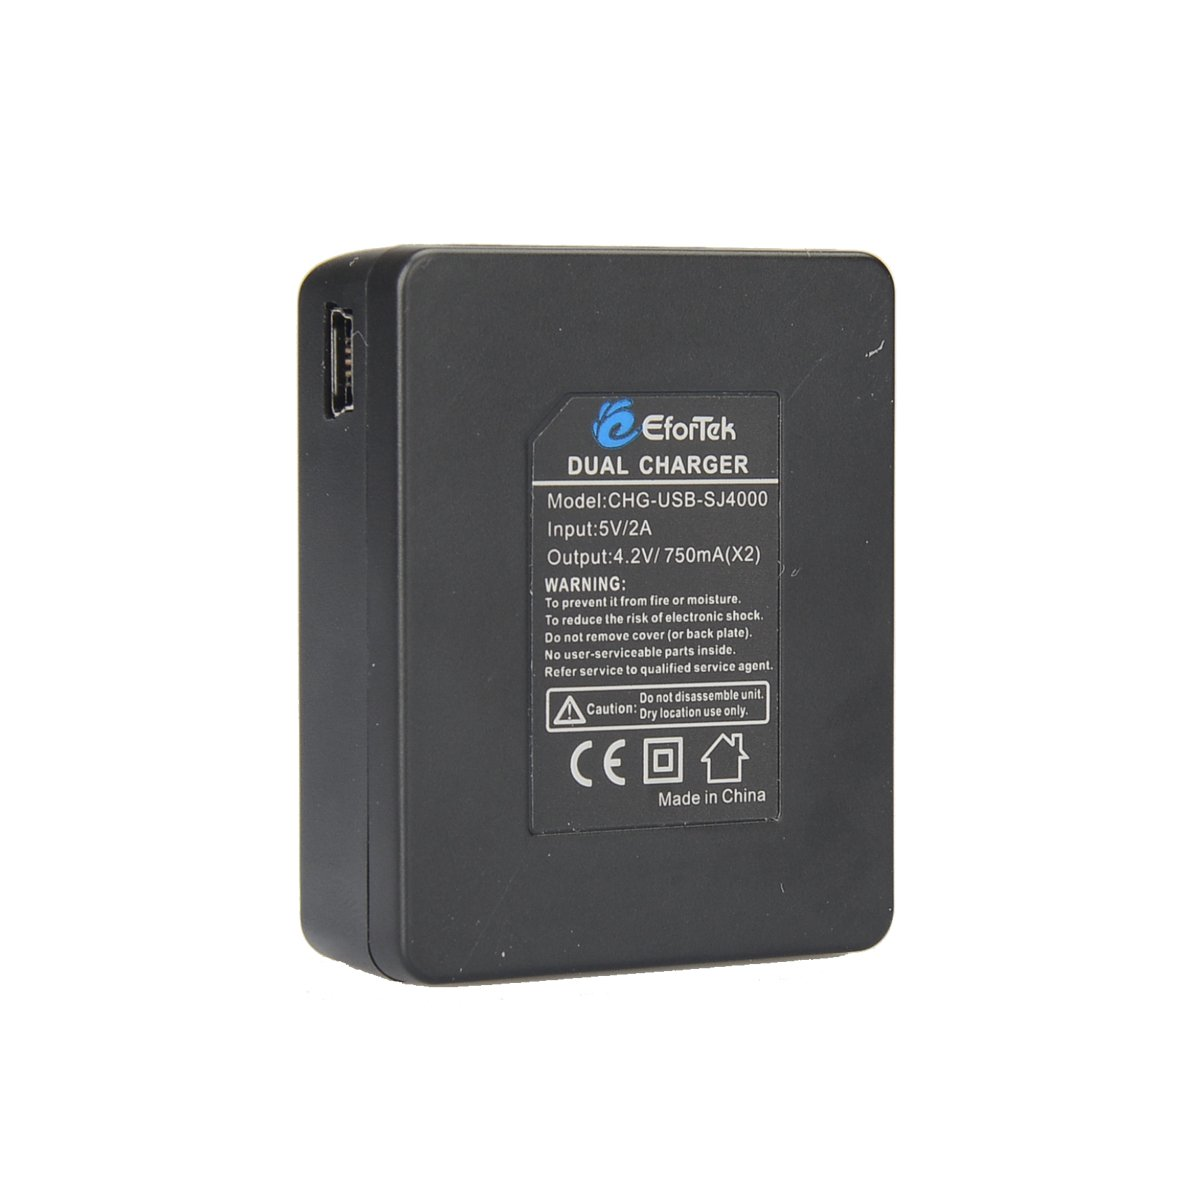 EforTek 1000mAh Li-ion Battery (2-Pack) and Dual USB Charger Kit for SJ4000,SJ5000,SJ6000 and Geekpro,DBPOWER,Gookit,SJCAM